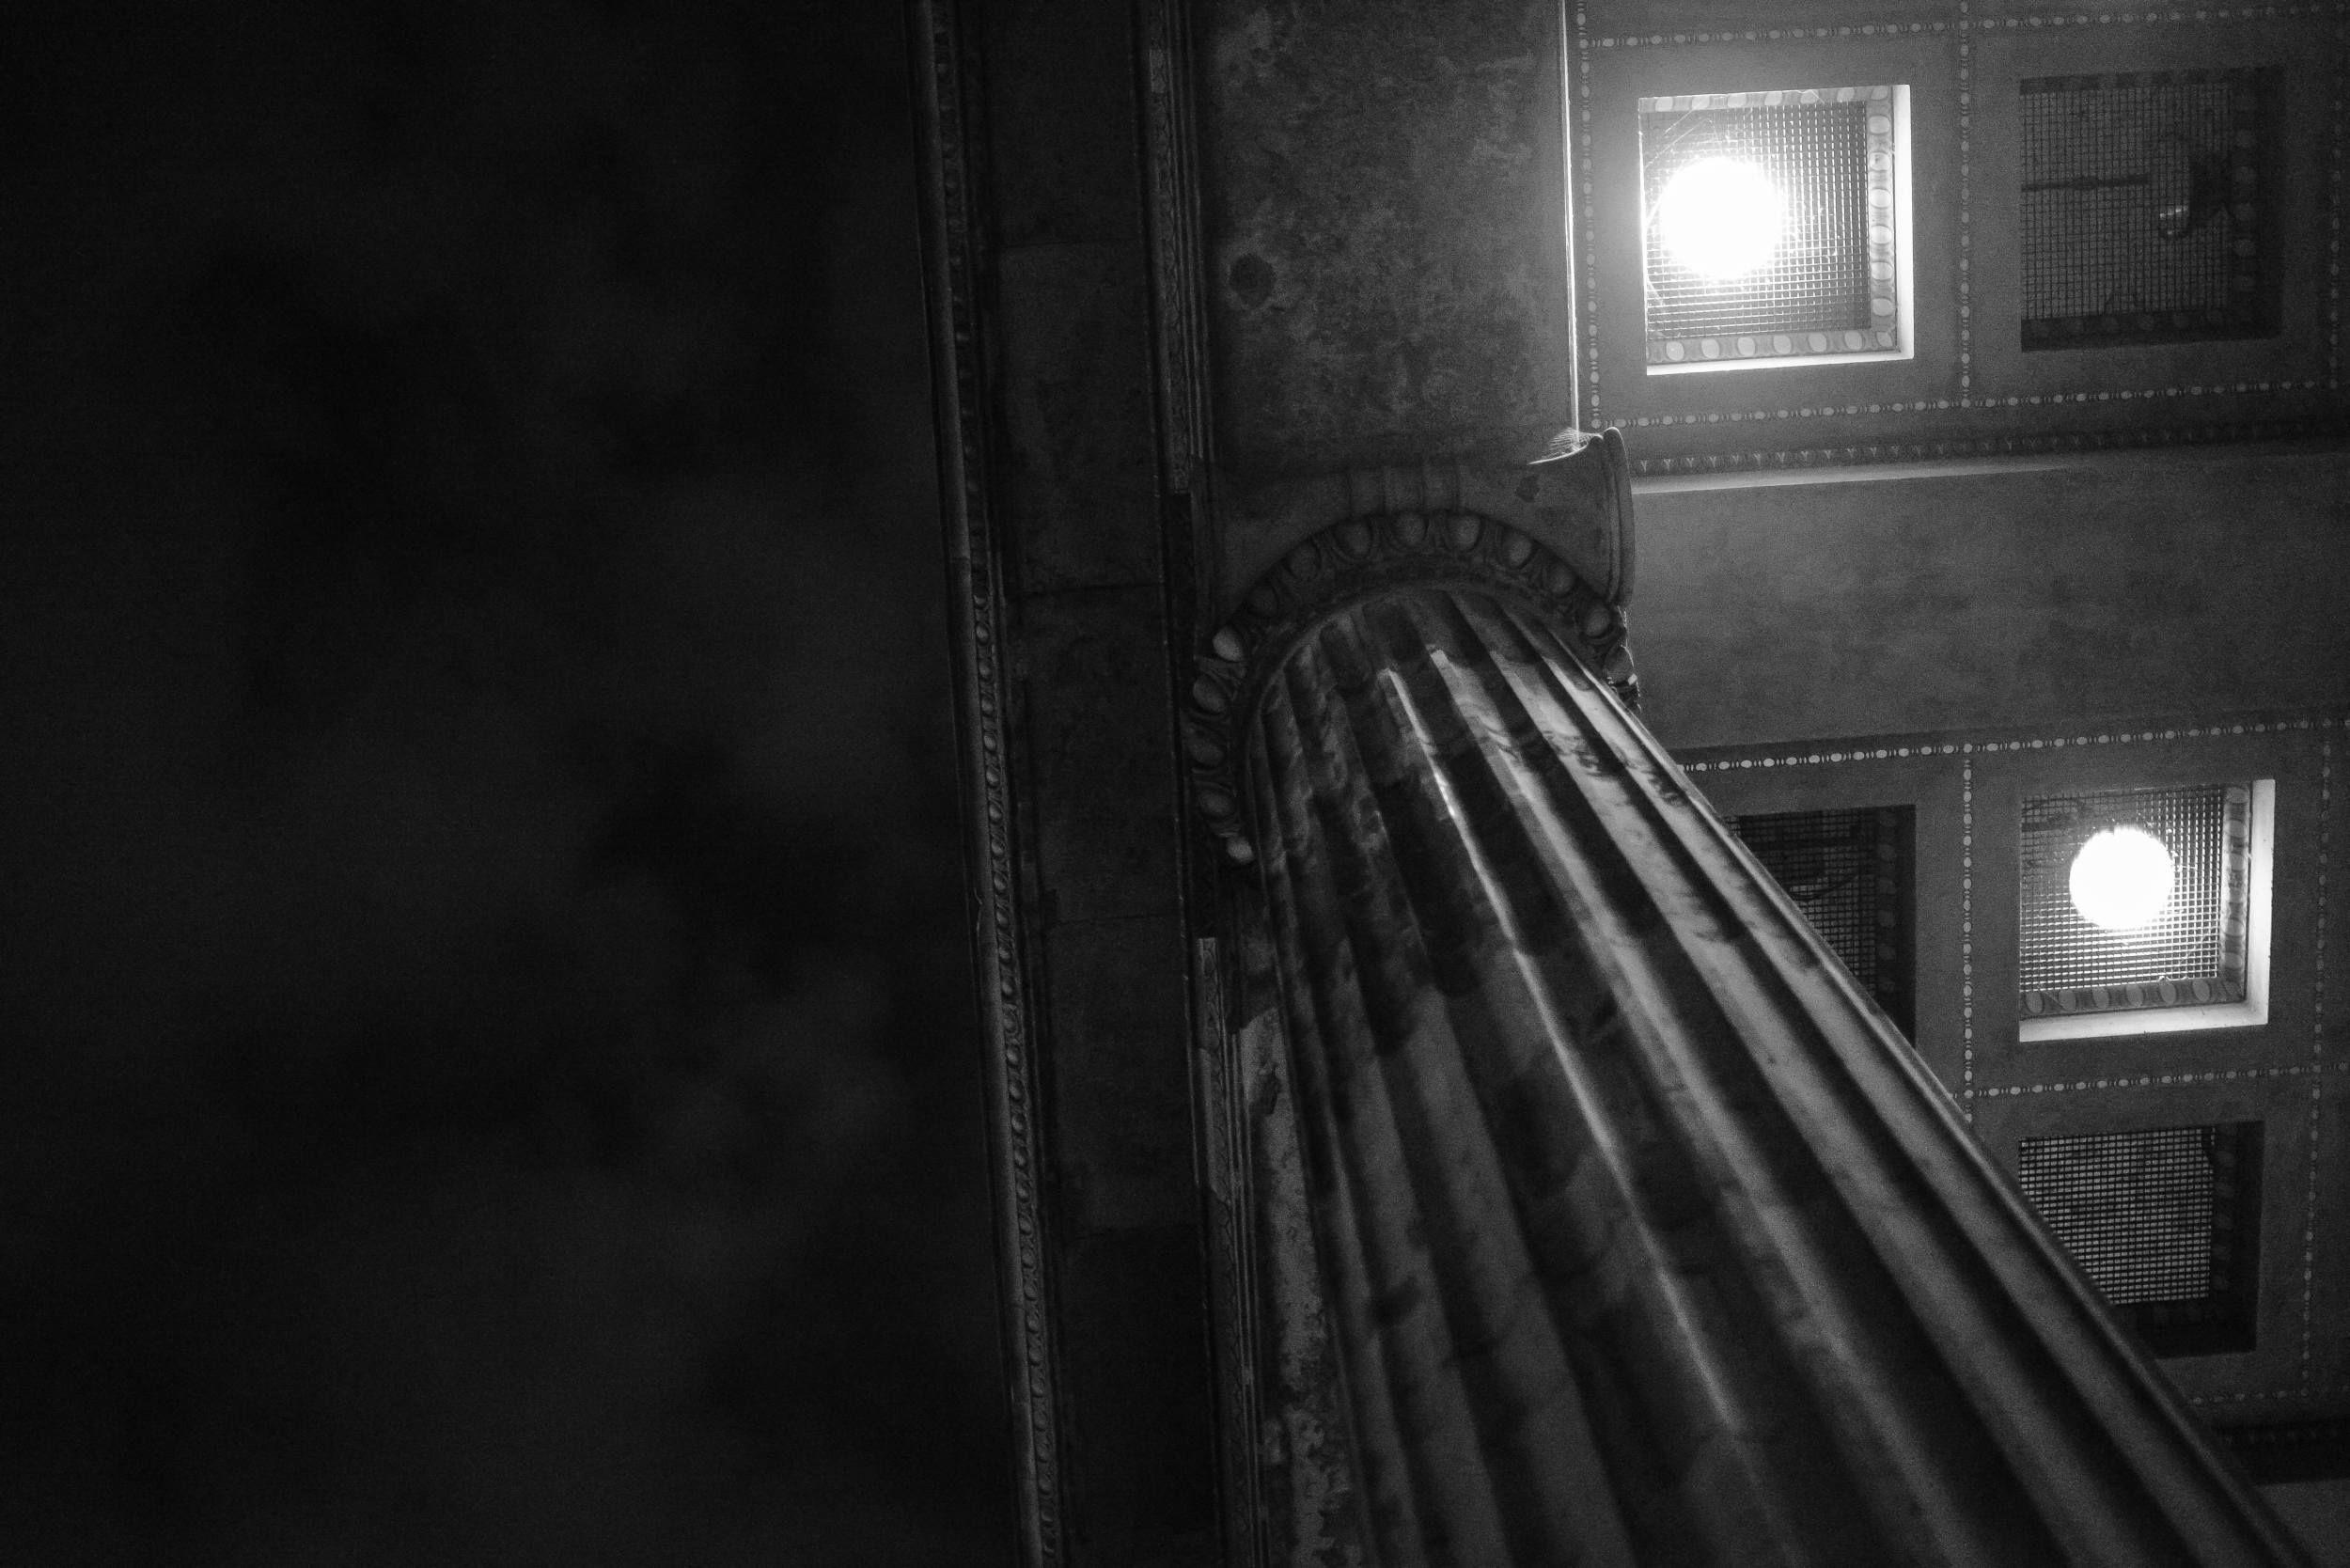 Carol of the bells - Blog Alina Nois